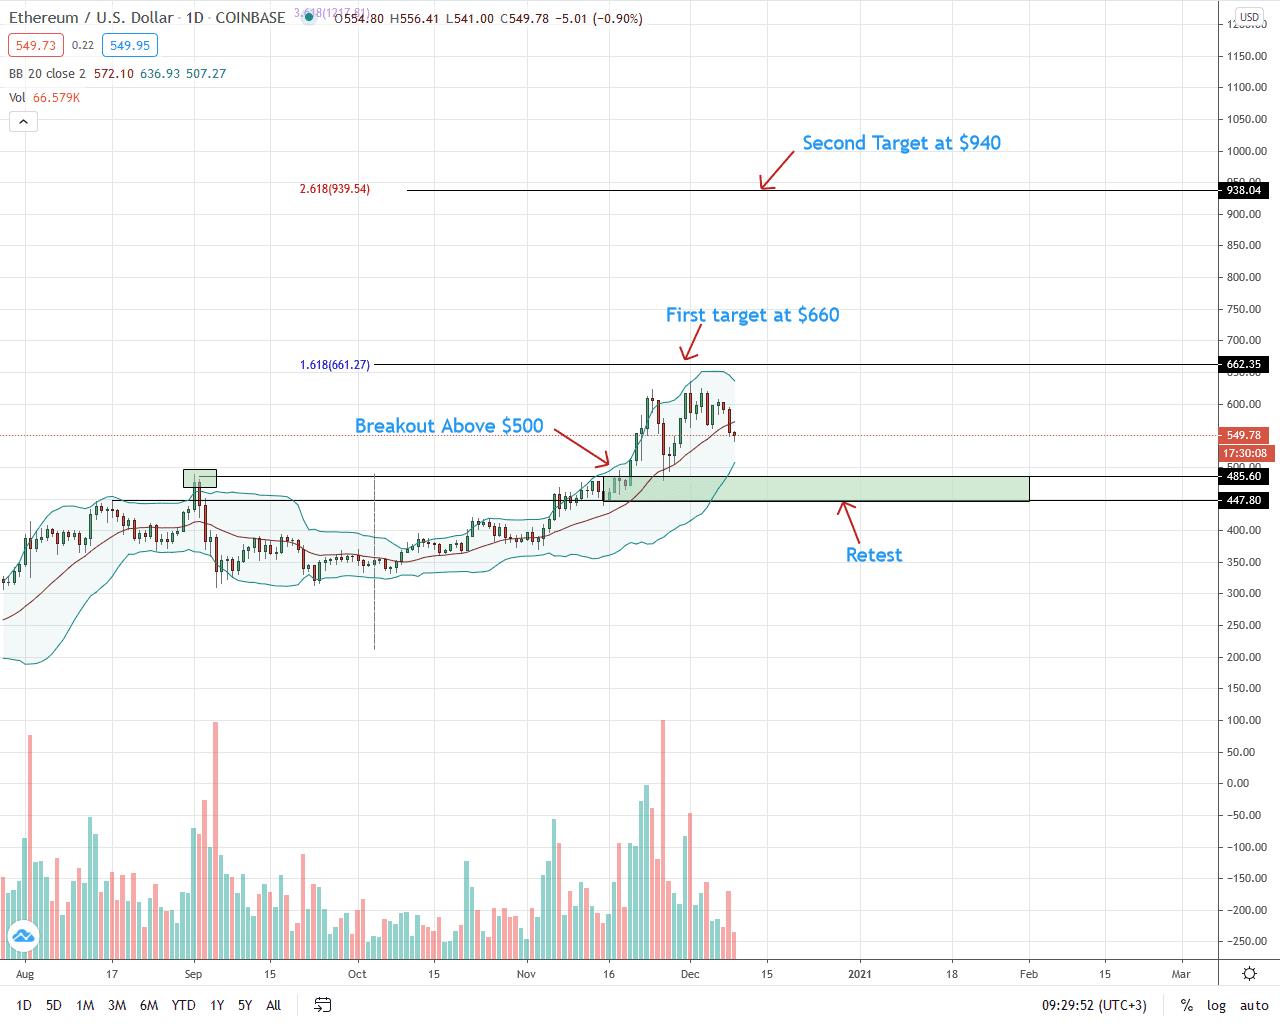 Ethereum Price Analysis for Dec 9